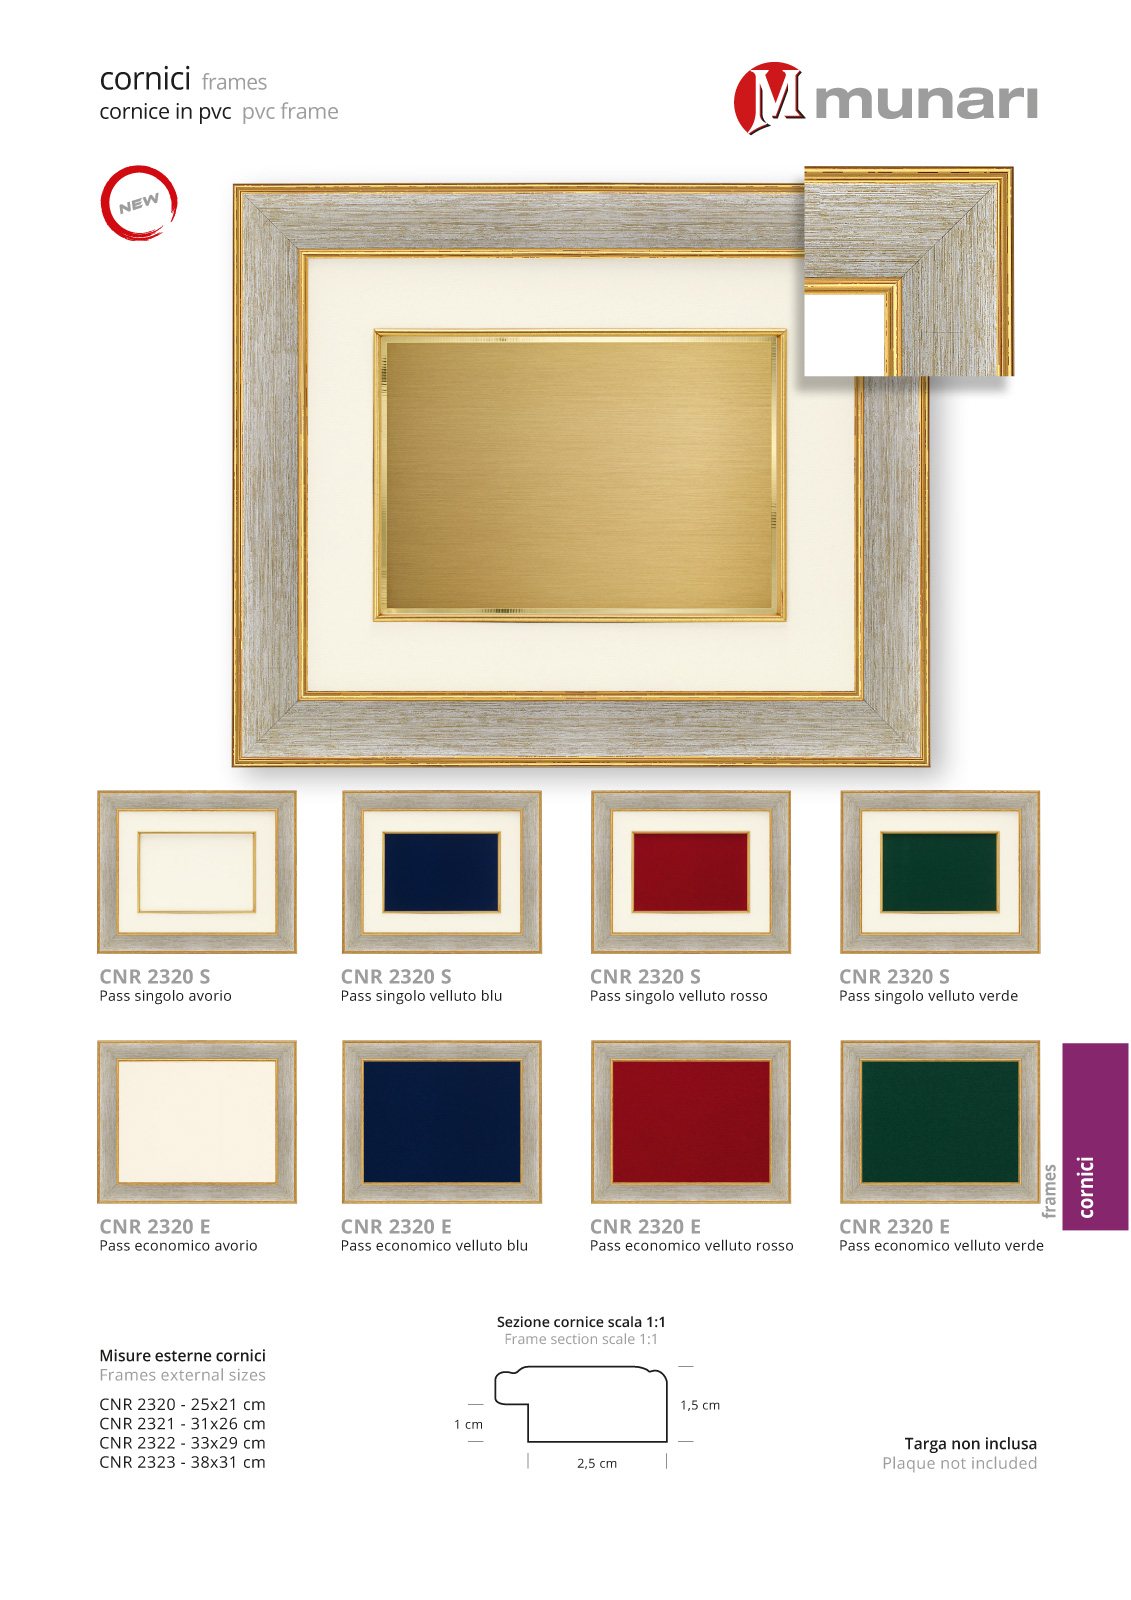 PVC frames series CNR 2320